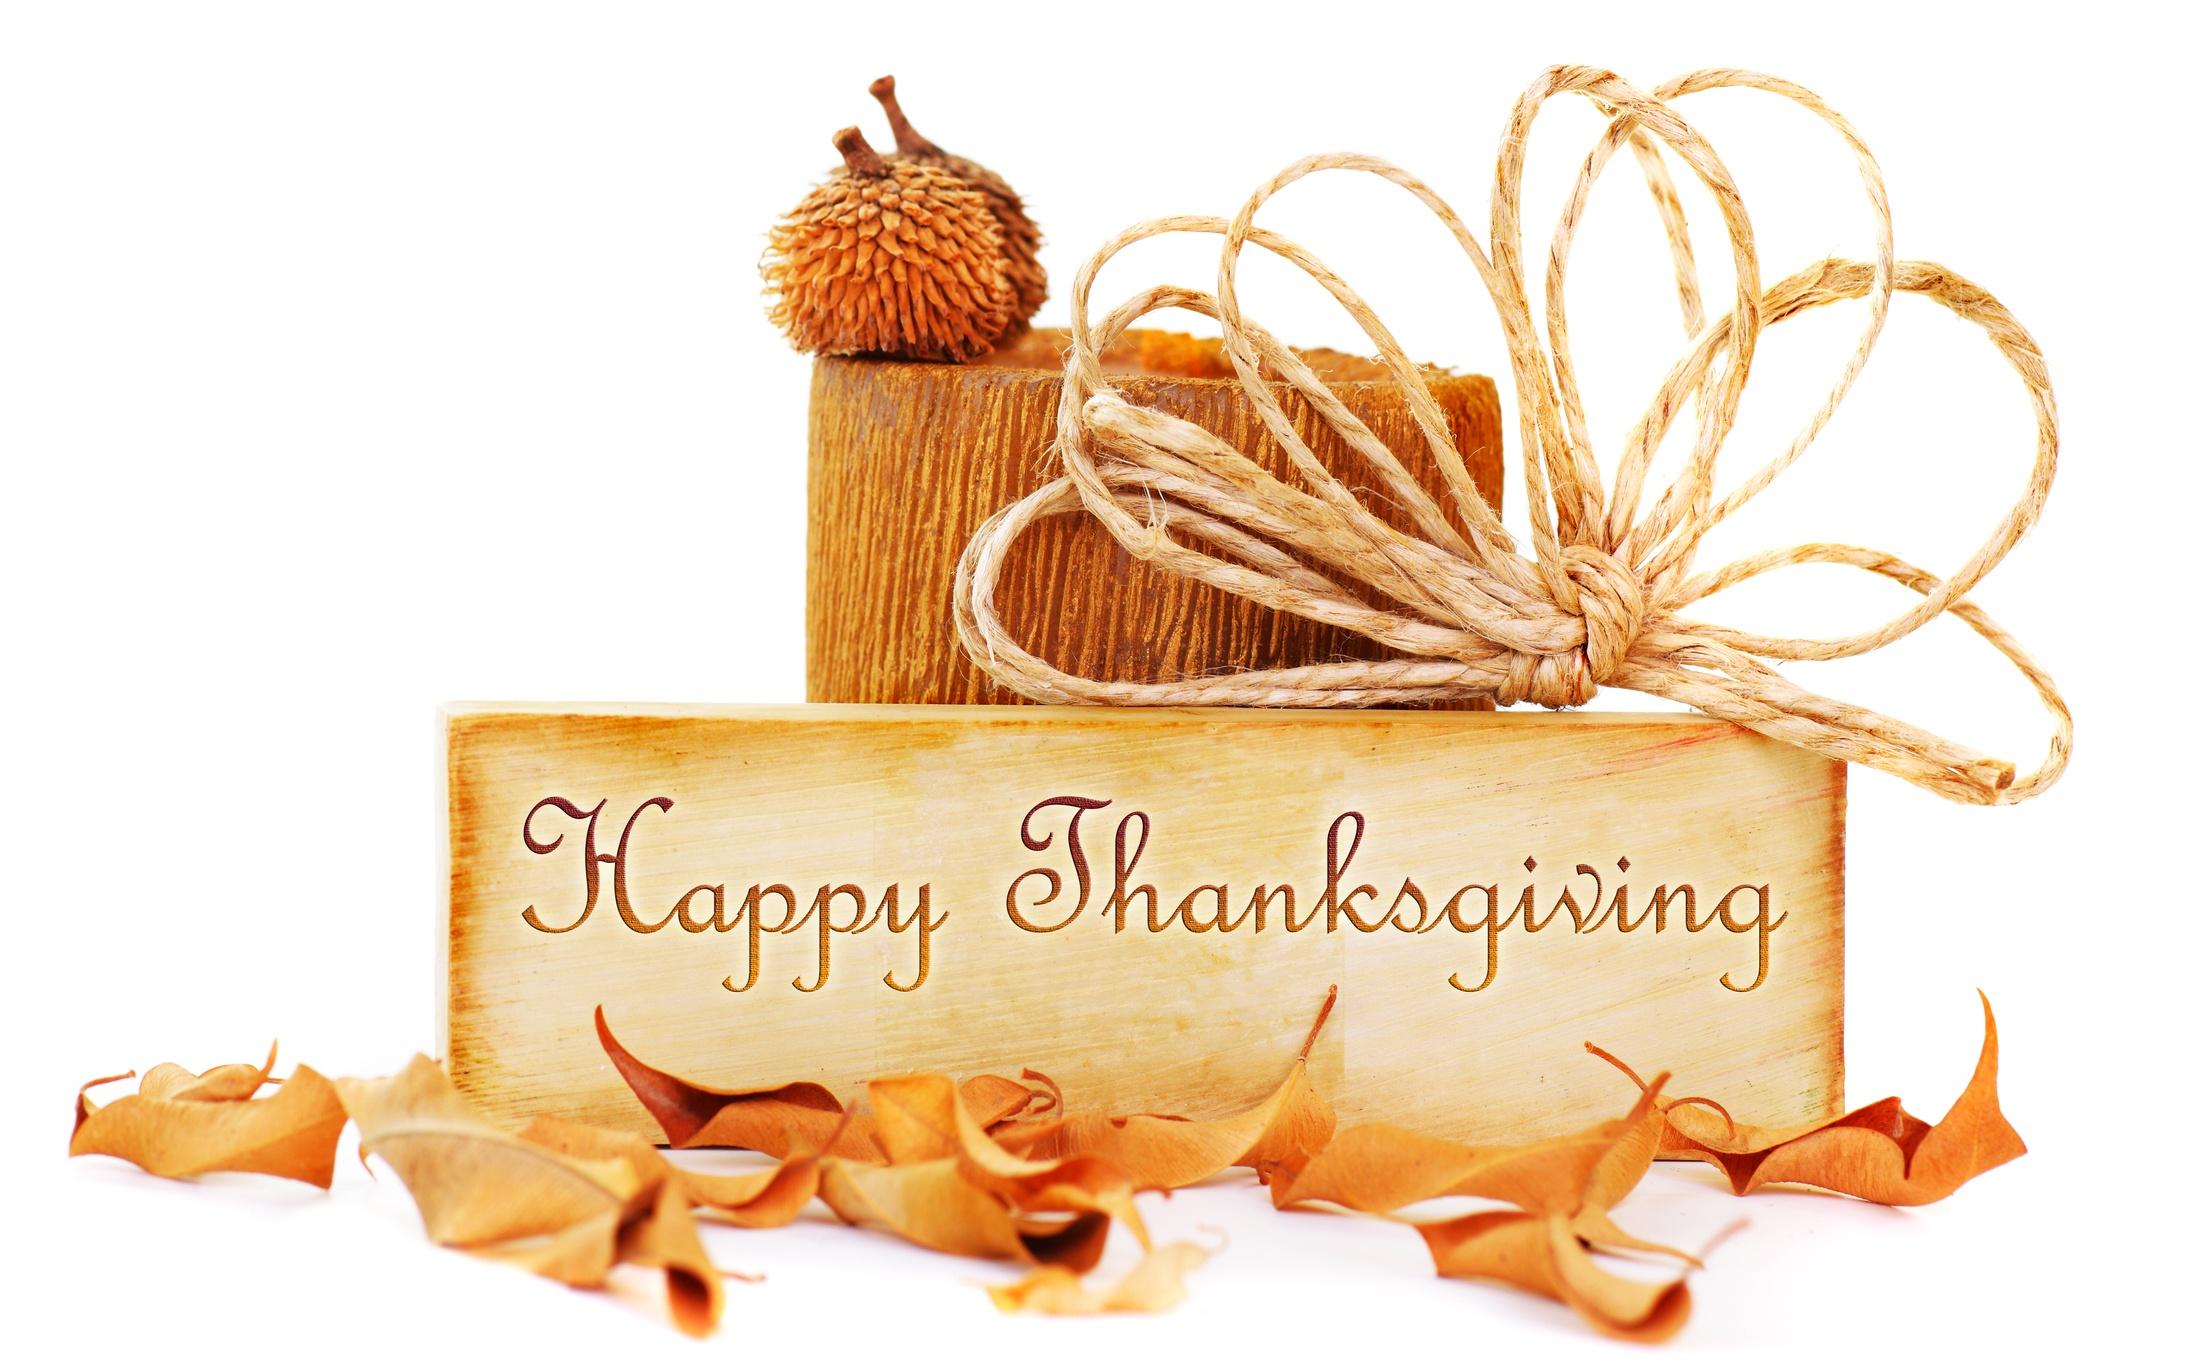 RMS_POS_Happy_Thanksgiving.jpg